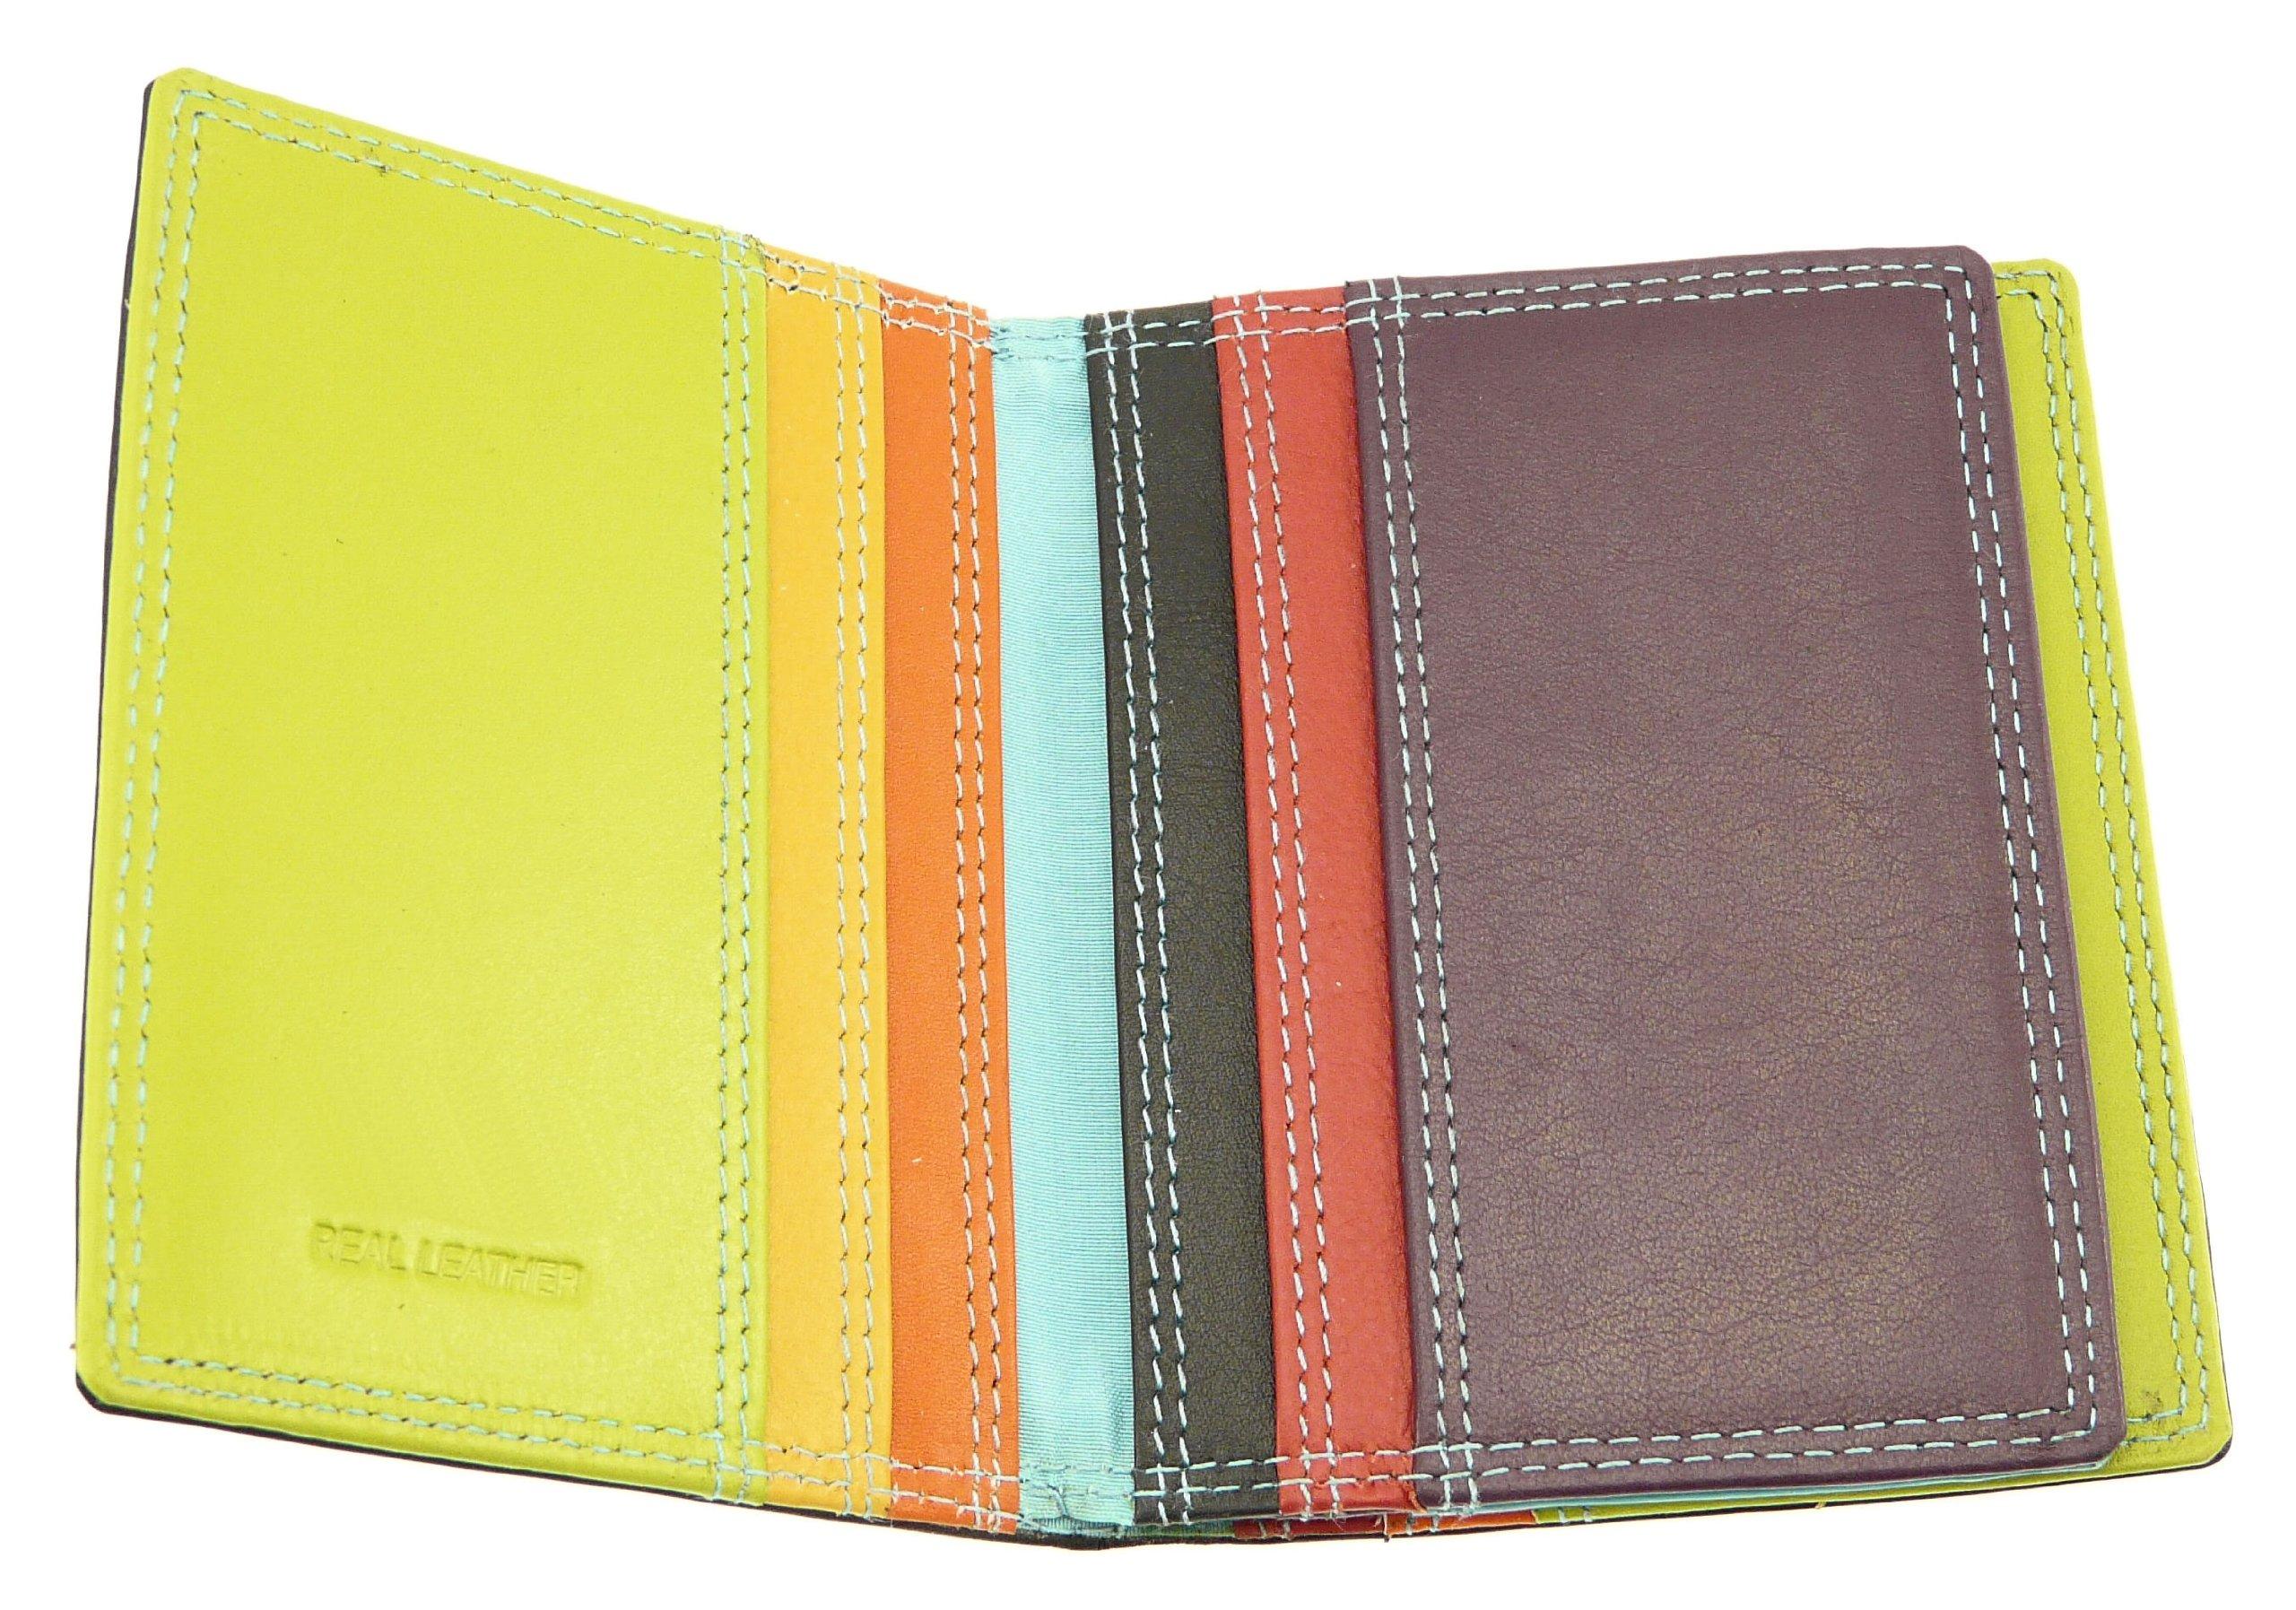 Black & Multi-color Leather Credit Card Holder / Wallet - Holds 10 Credit Cards by Neptune Giftware (Image #4)